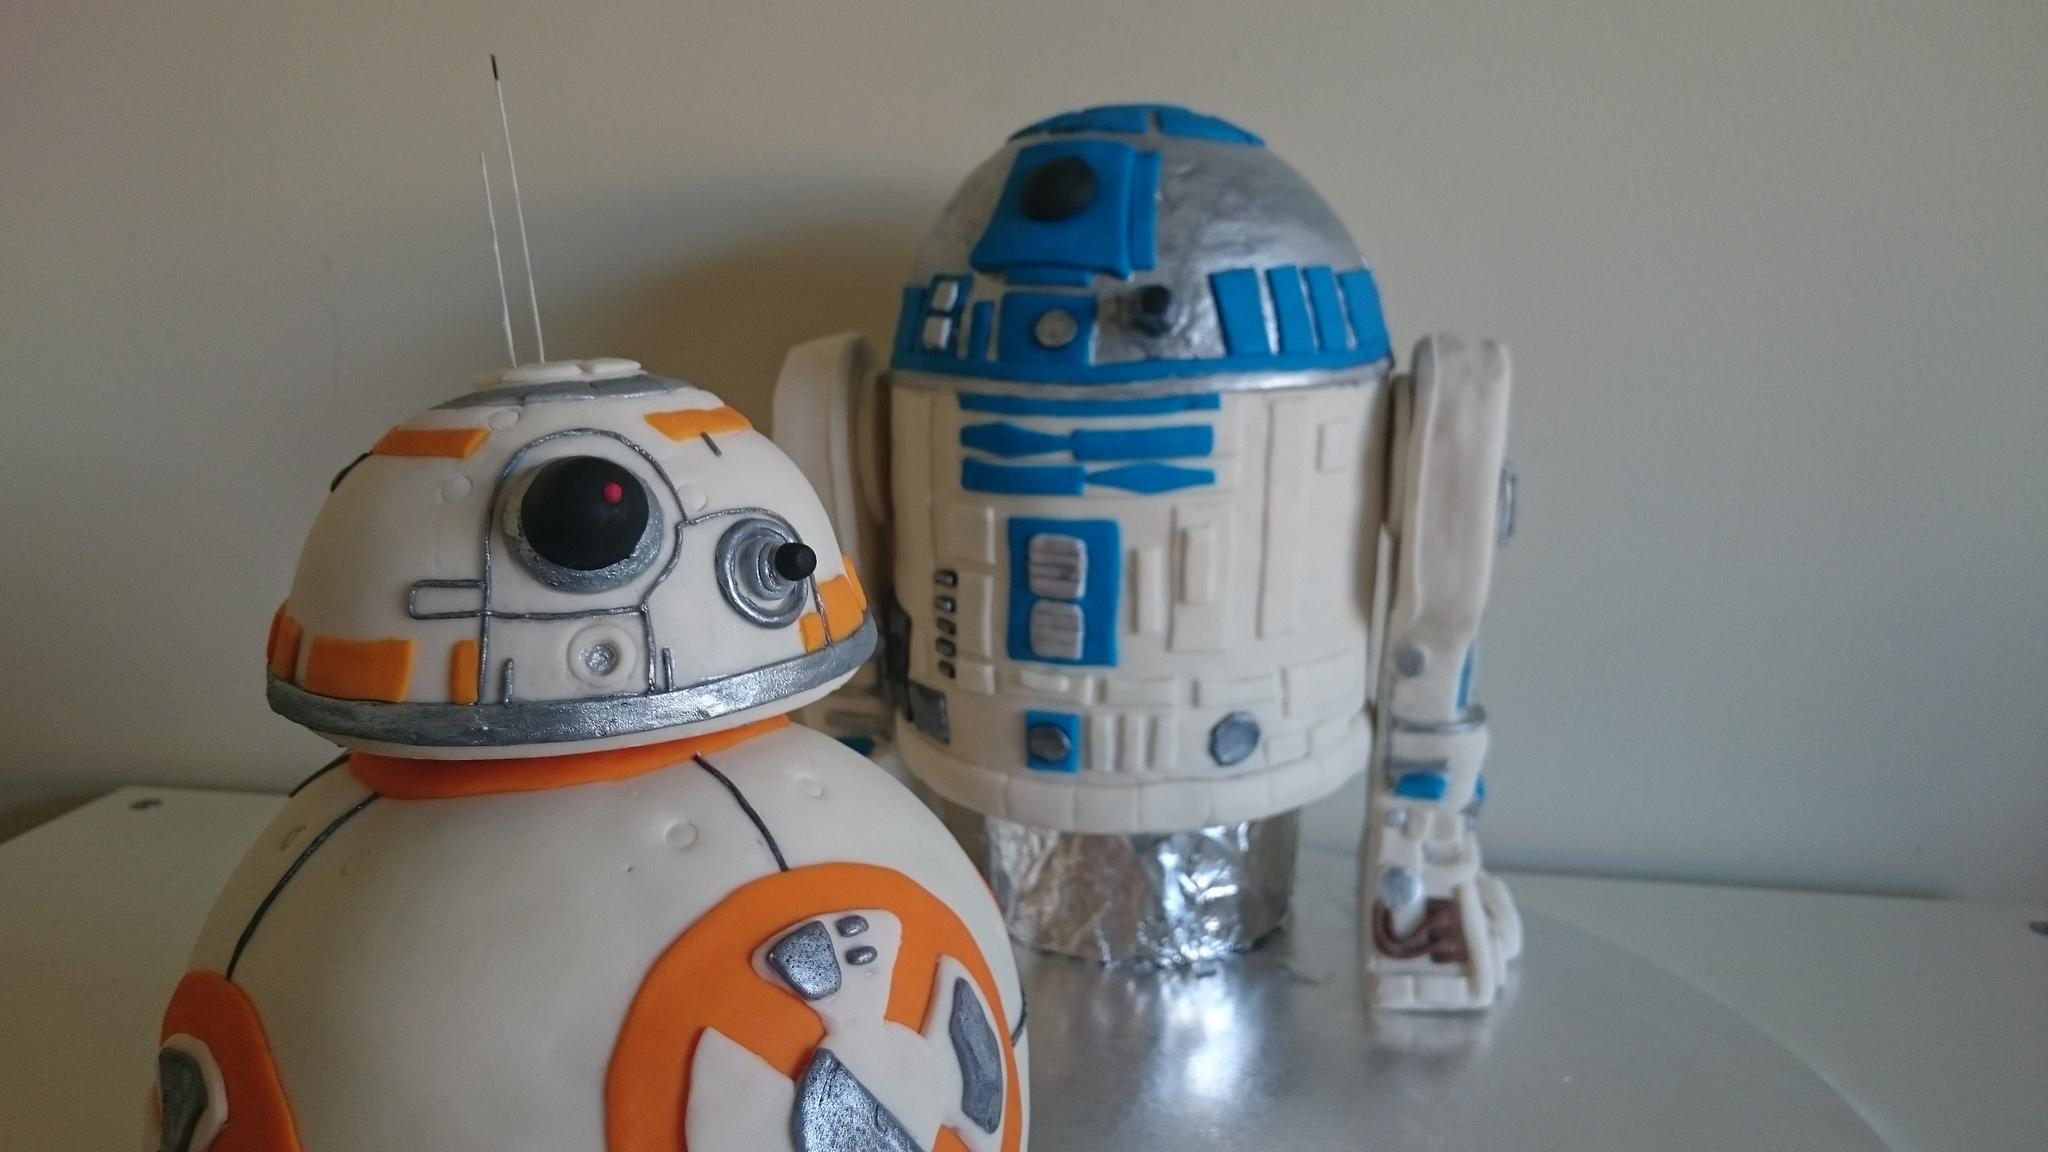 BB8 & R2D2 Cakes   ⓒ Tama Leaver/Flickr